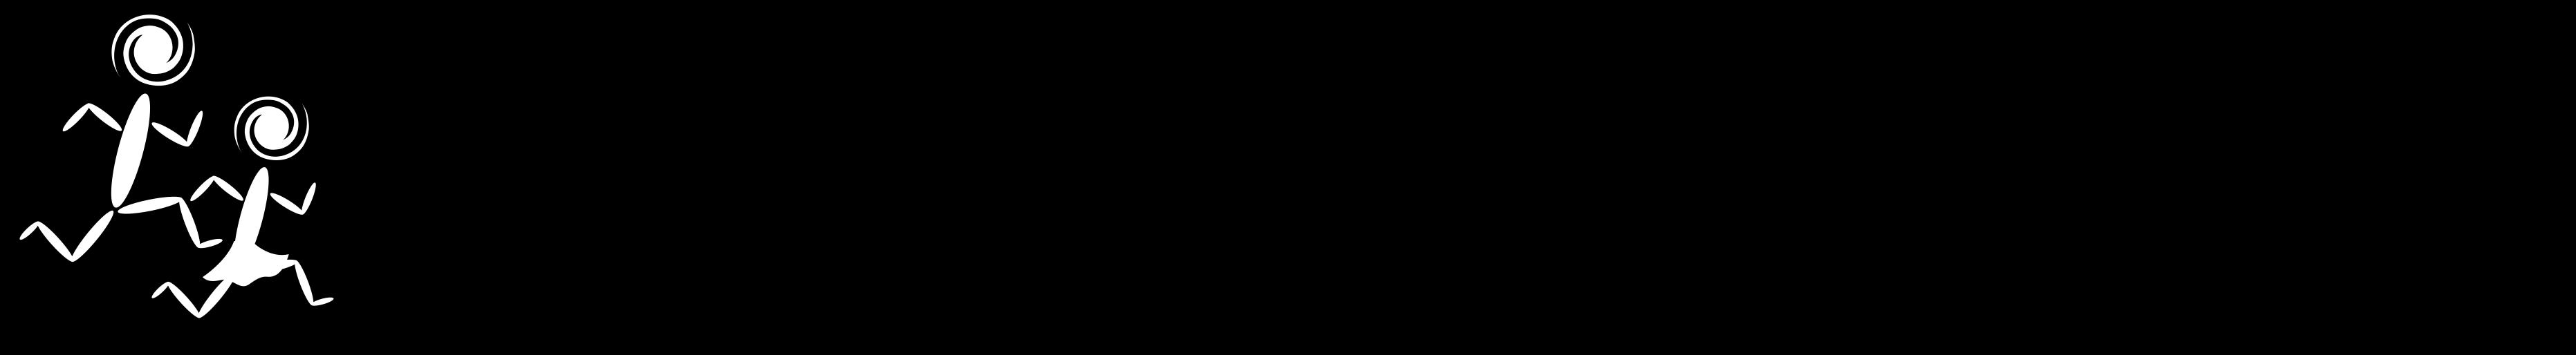 TeamFootWorks  logo